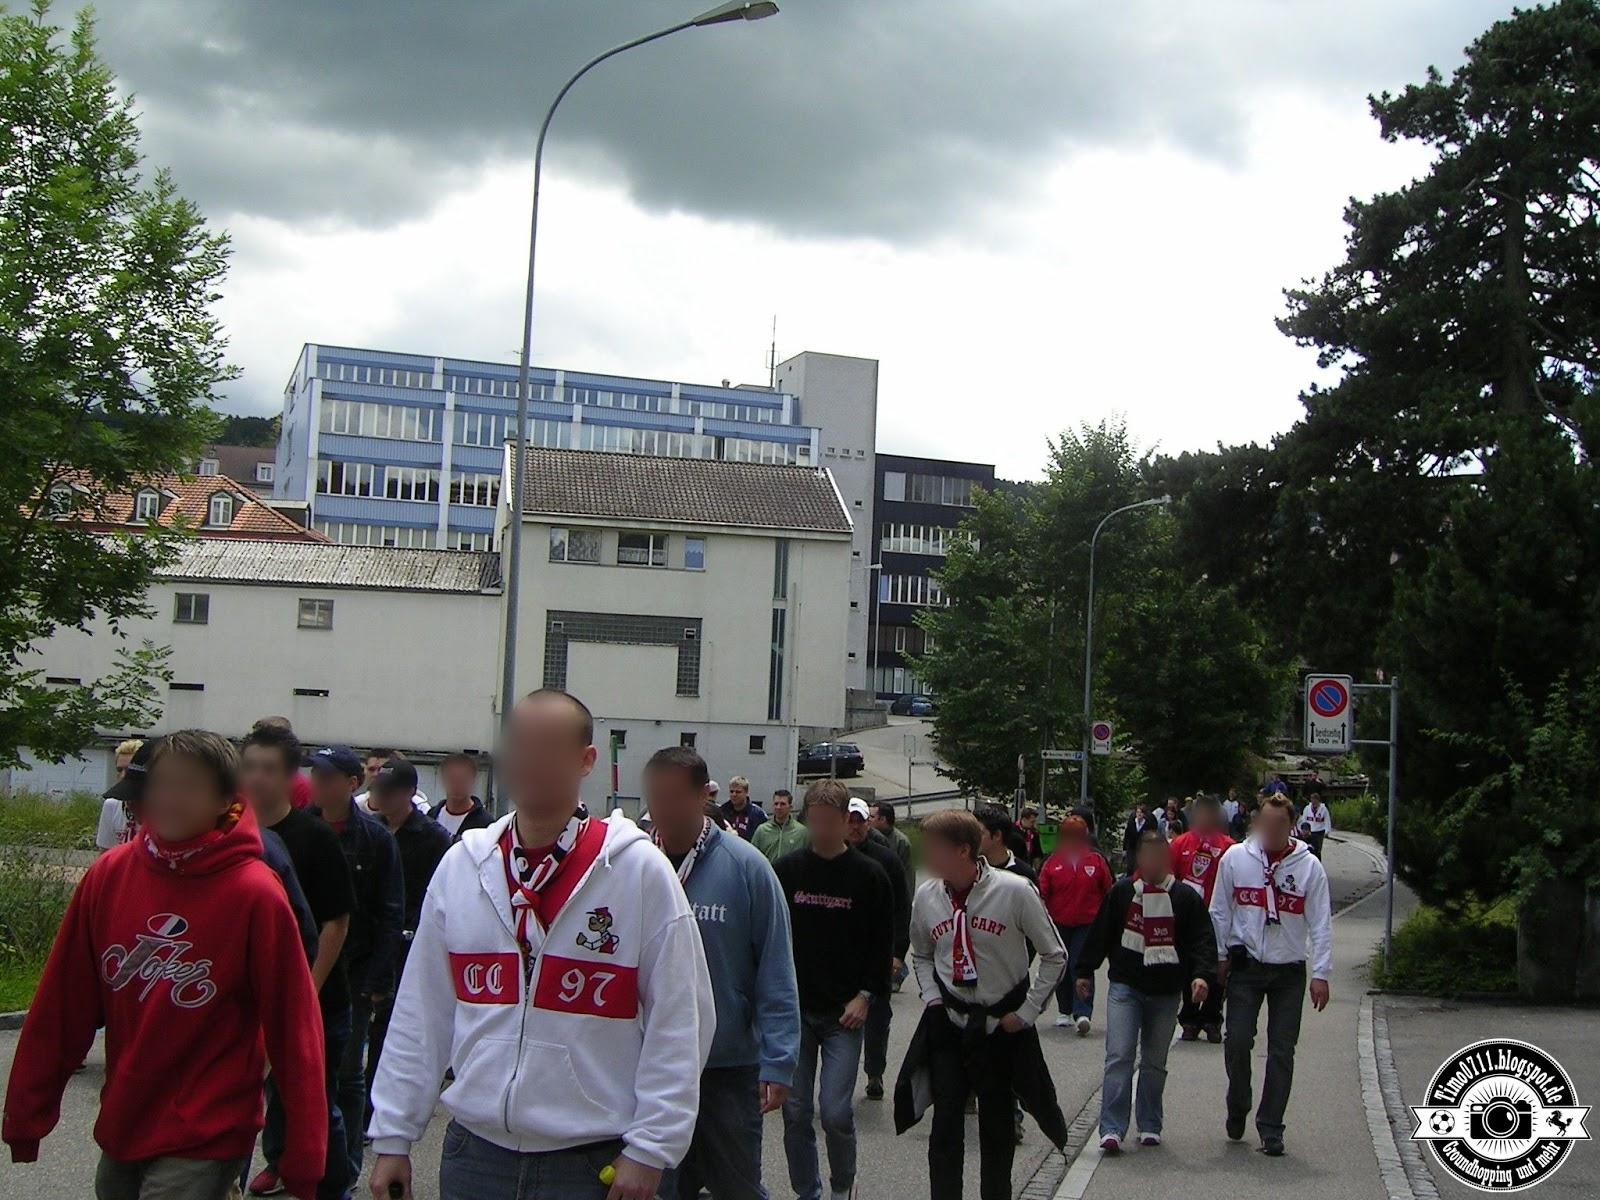 Stuttgart St Gallen